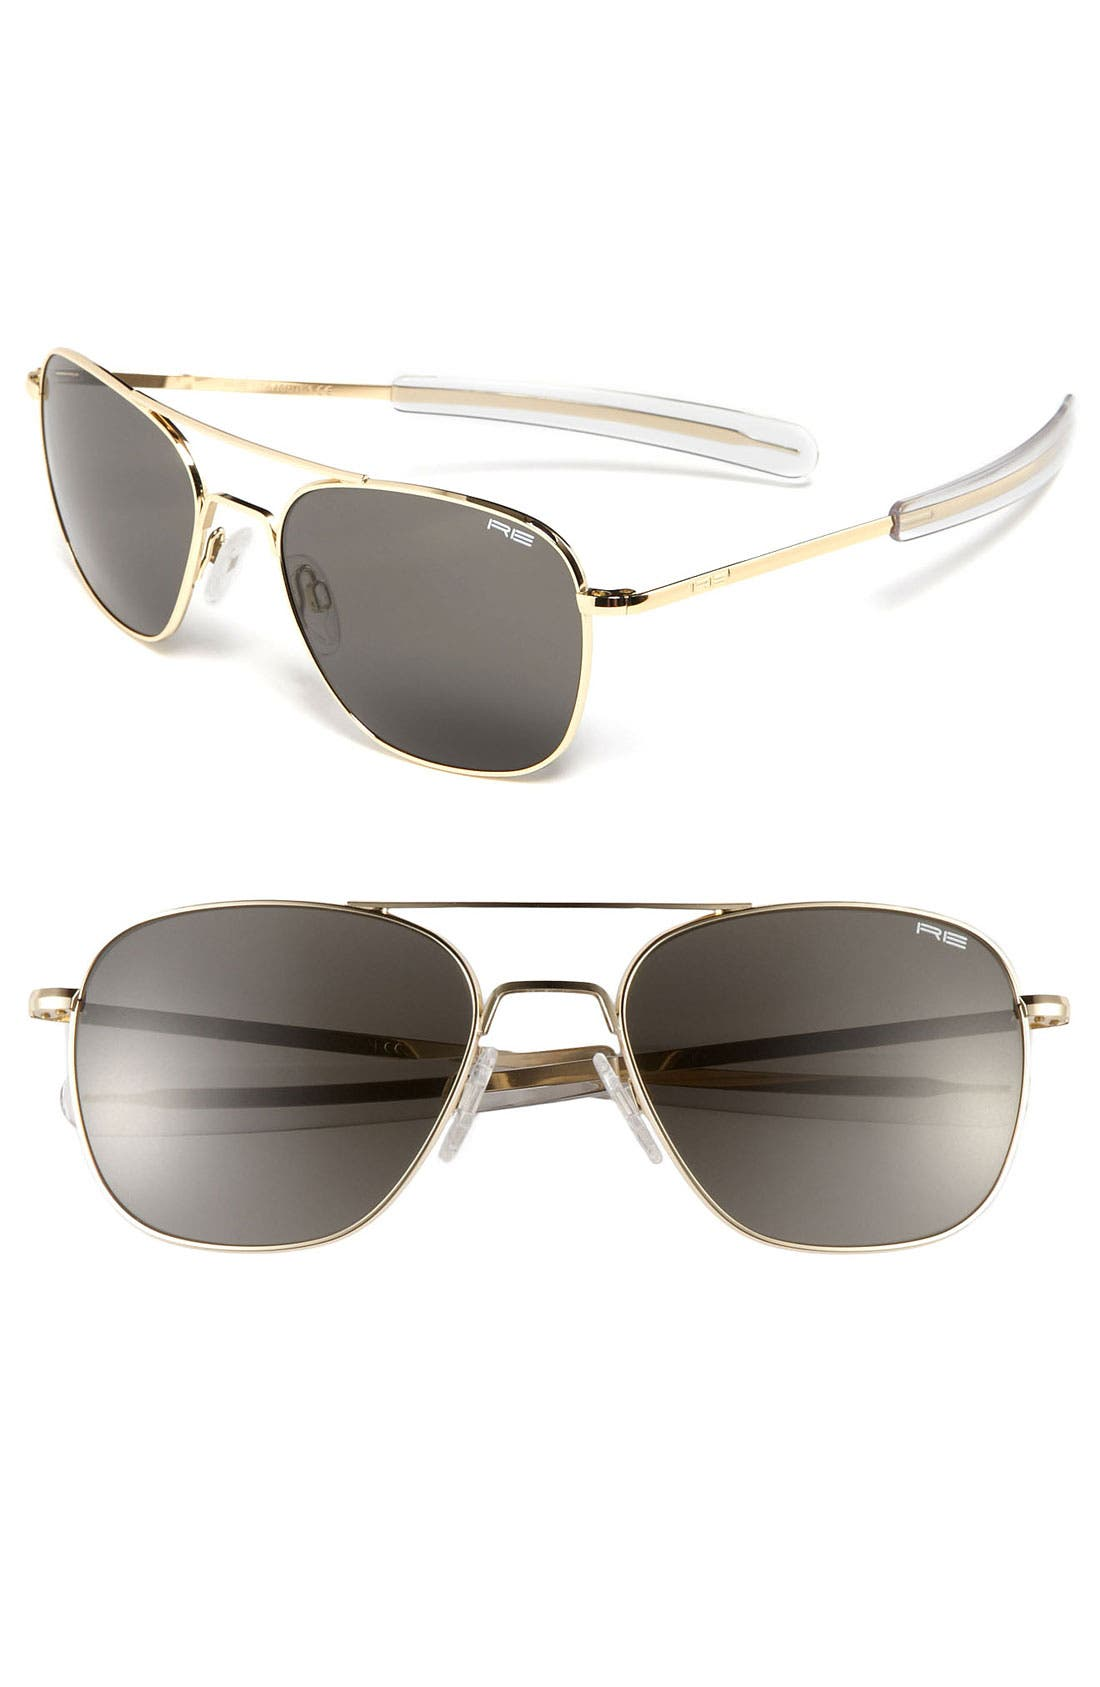 Main Image - Randolph Engineering 58mm Aviator Sunglasses